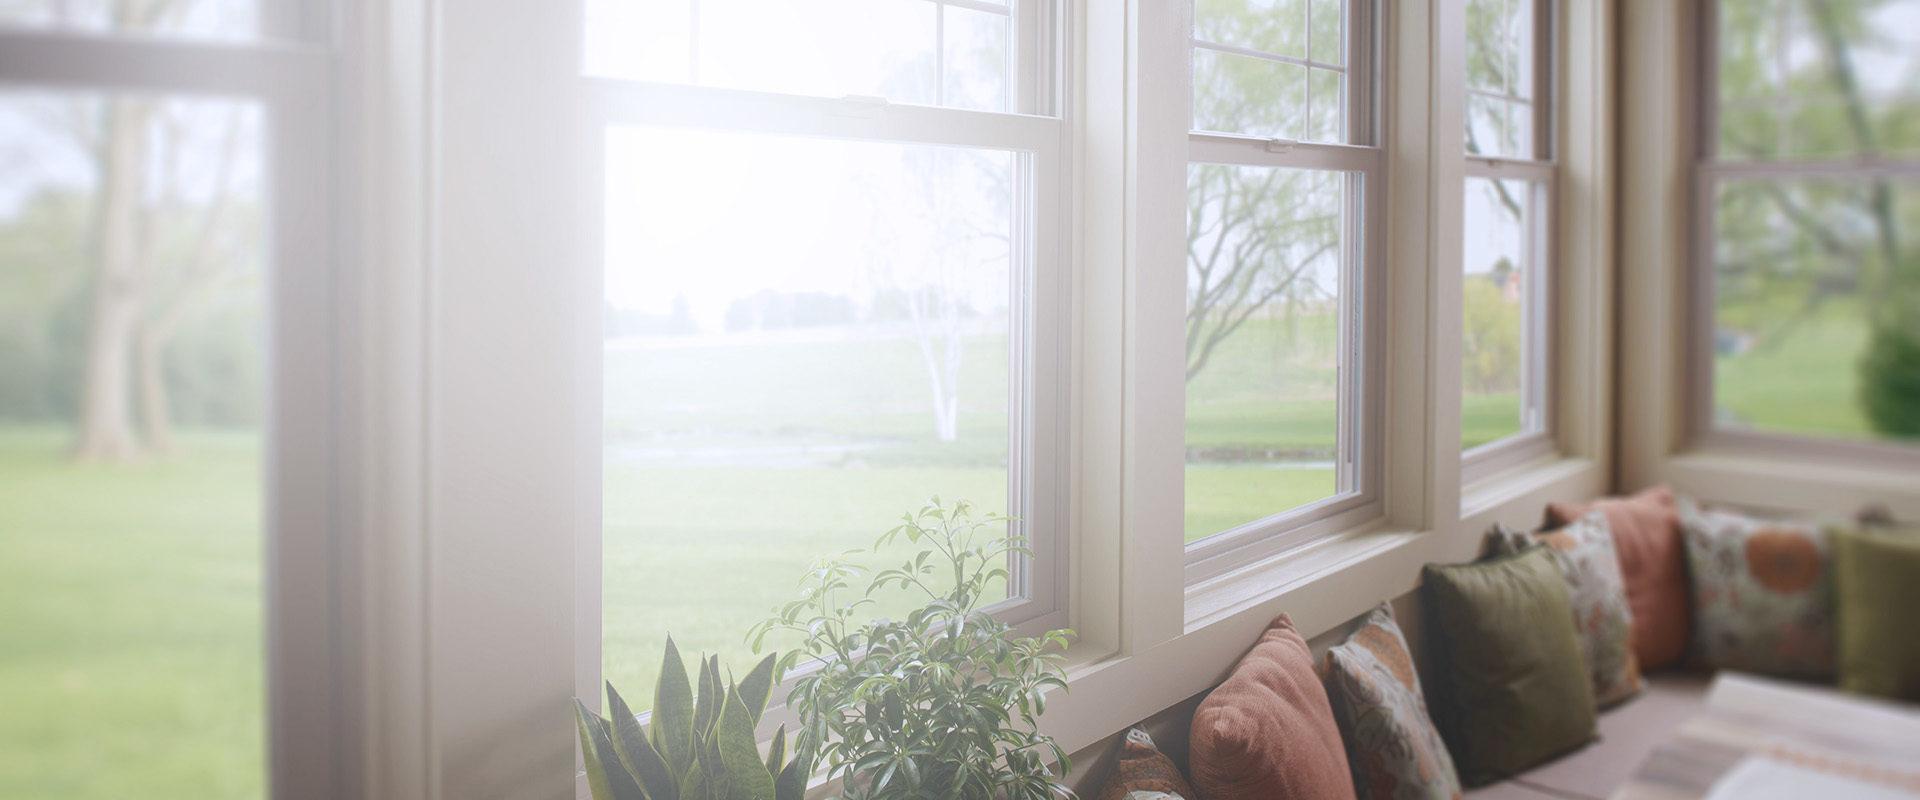 Картинка пвх окно